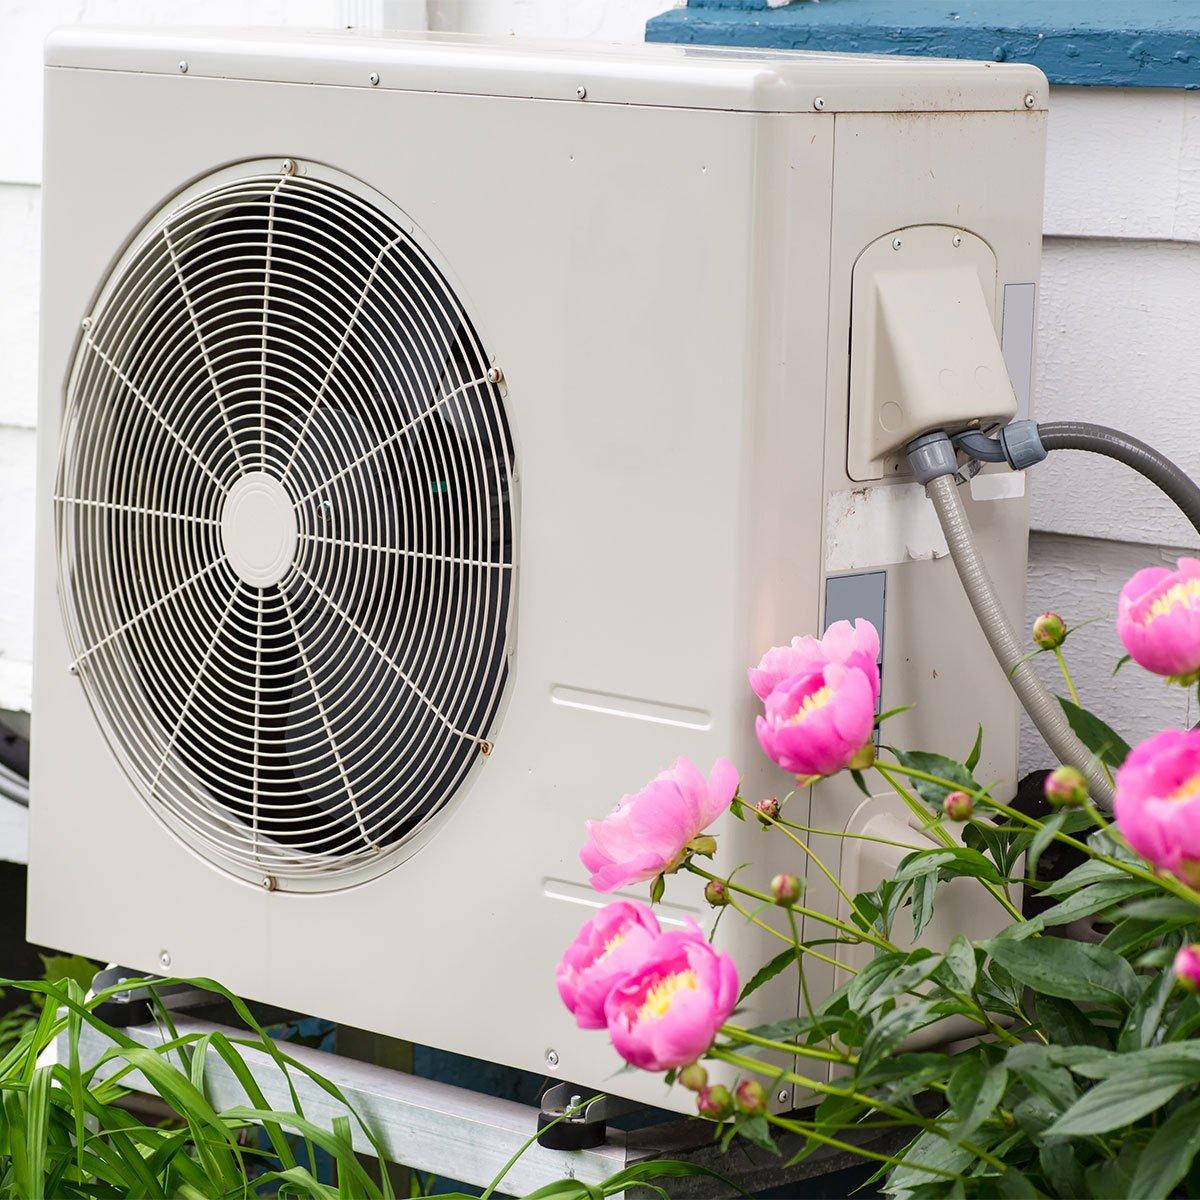 Outdoor heat pump in garden surrounded by flowers